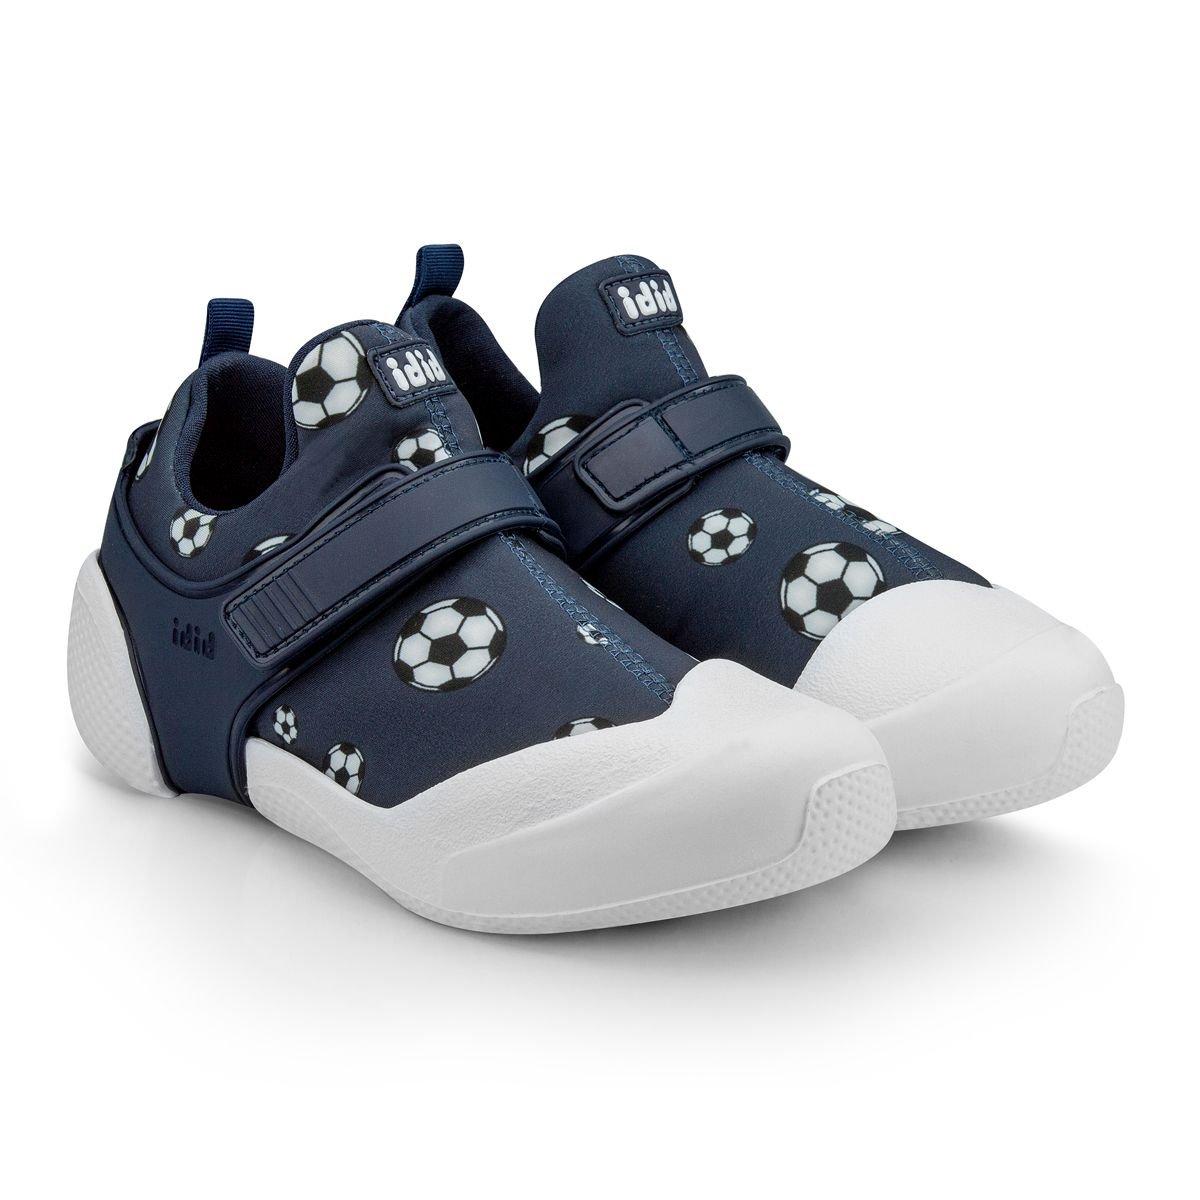 Pantofi sport Bibi Shoes 2Way Football imagine